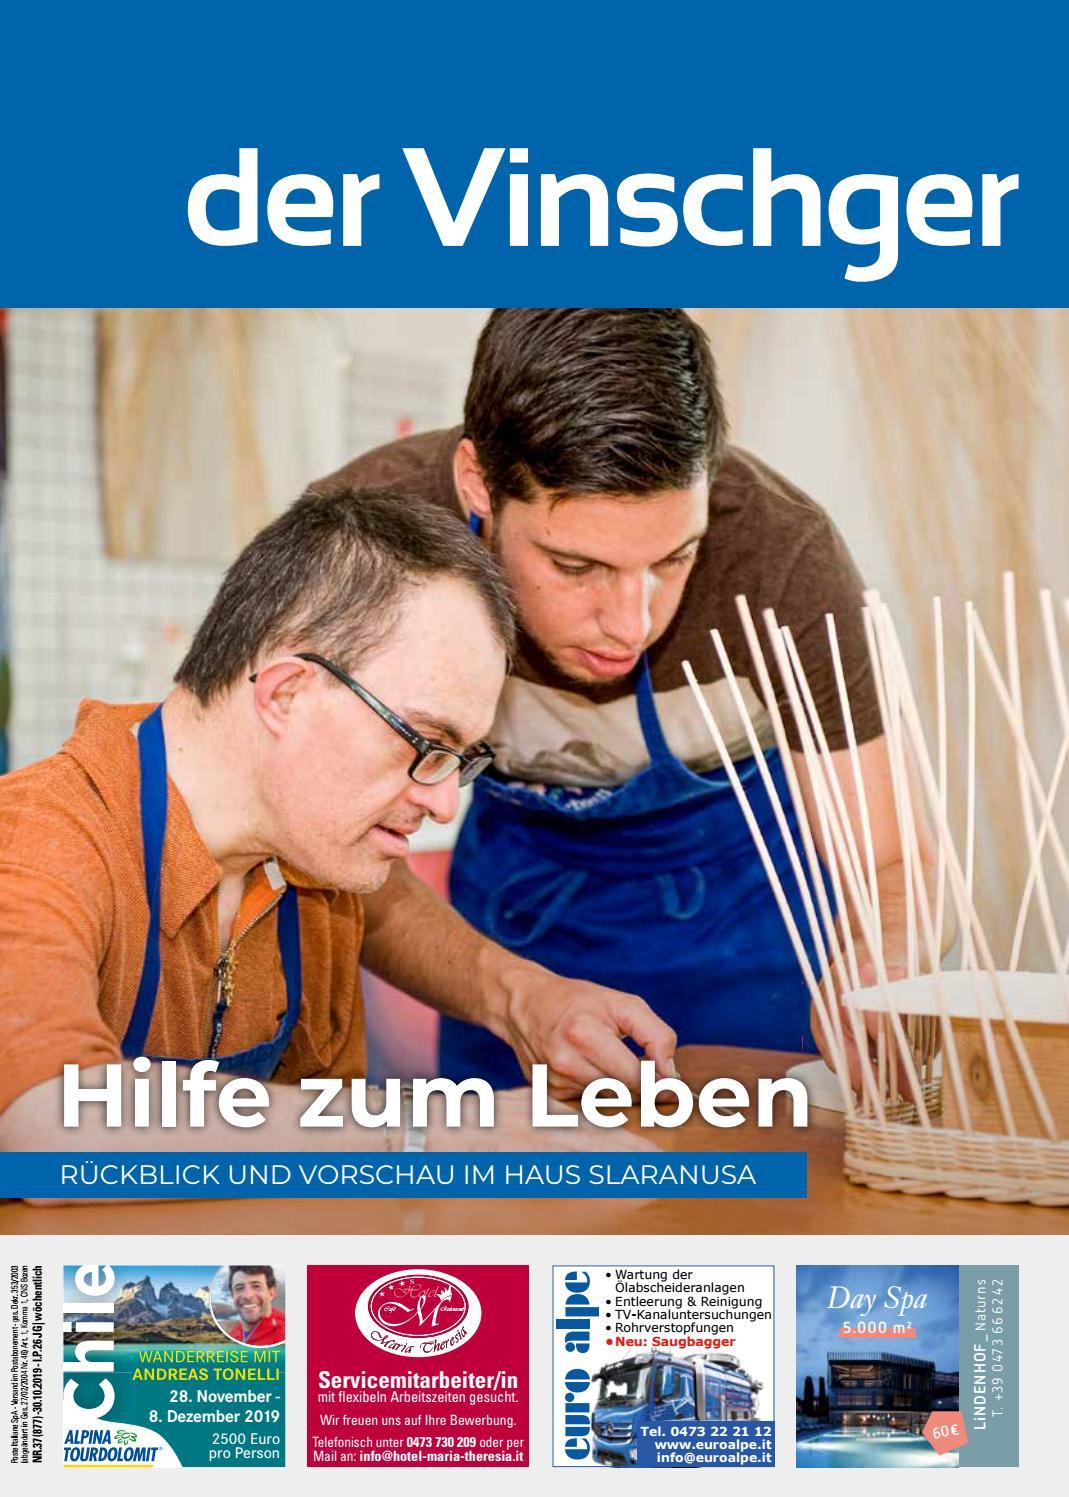 Hilfe zum Leben by GmbH issuu